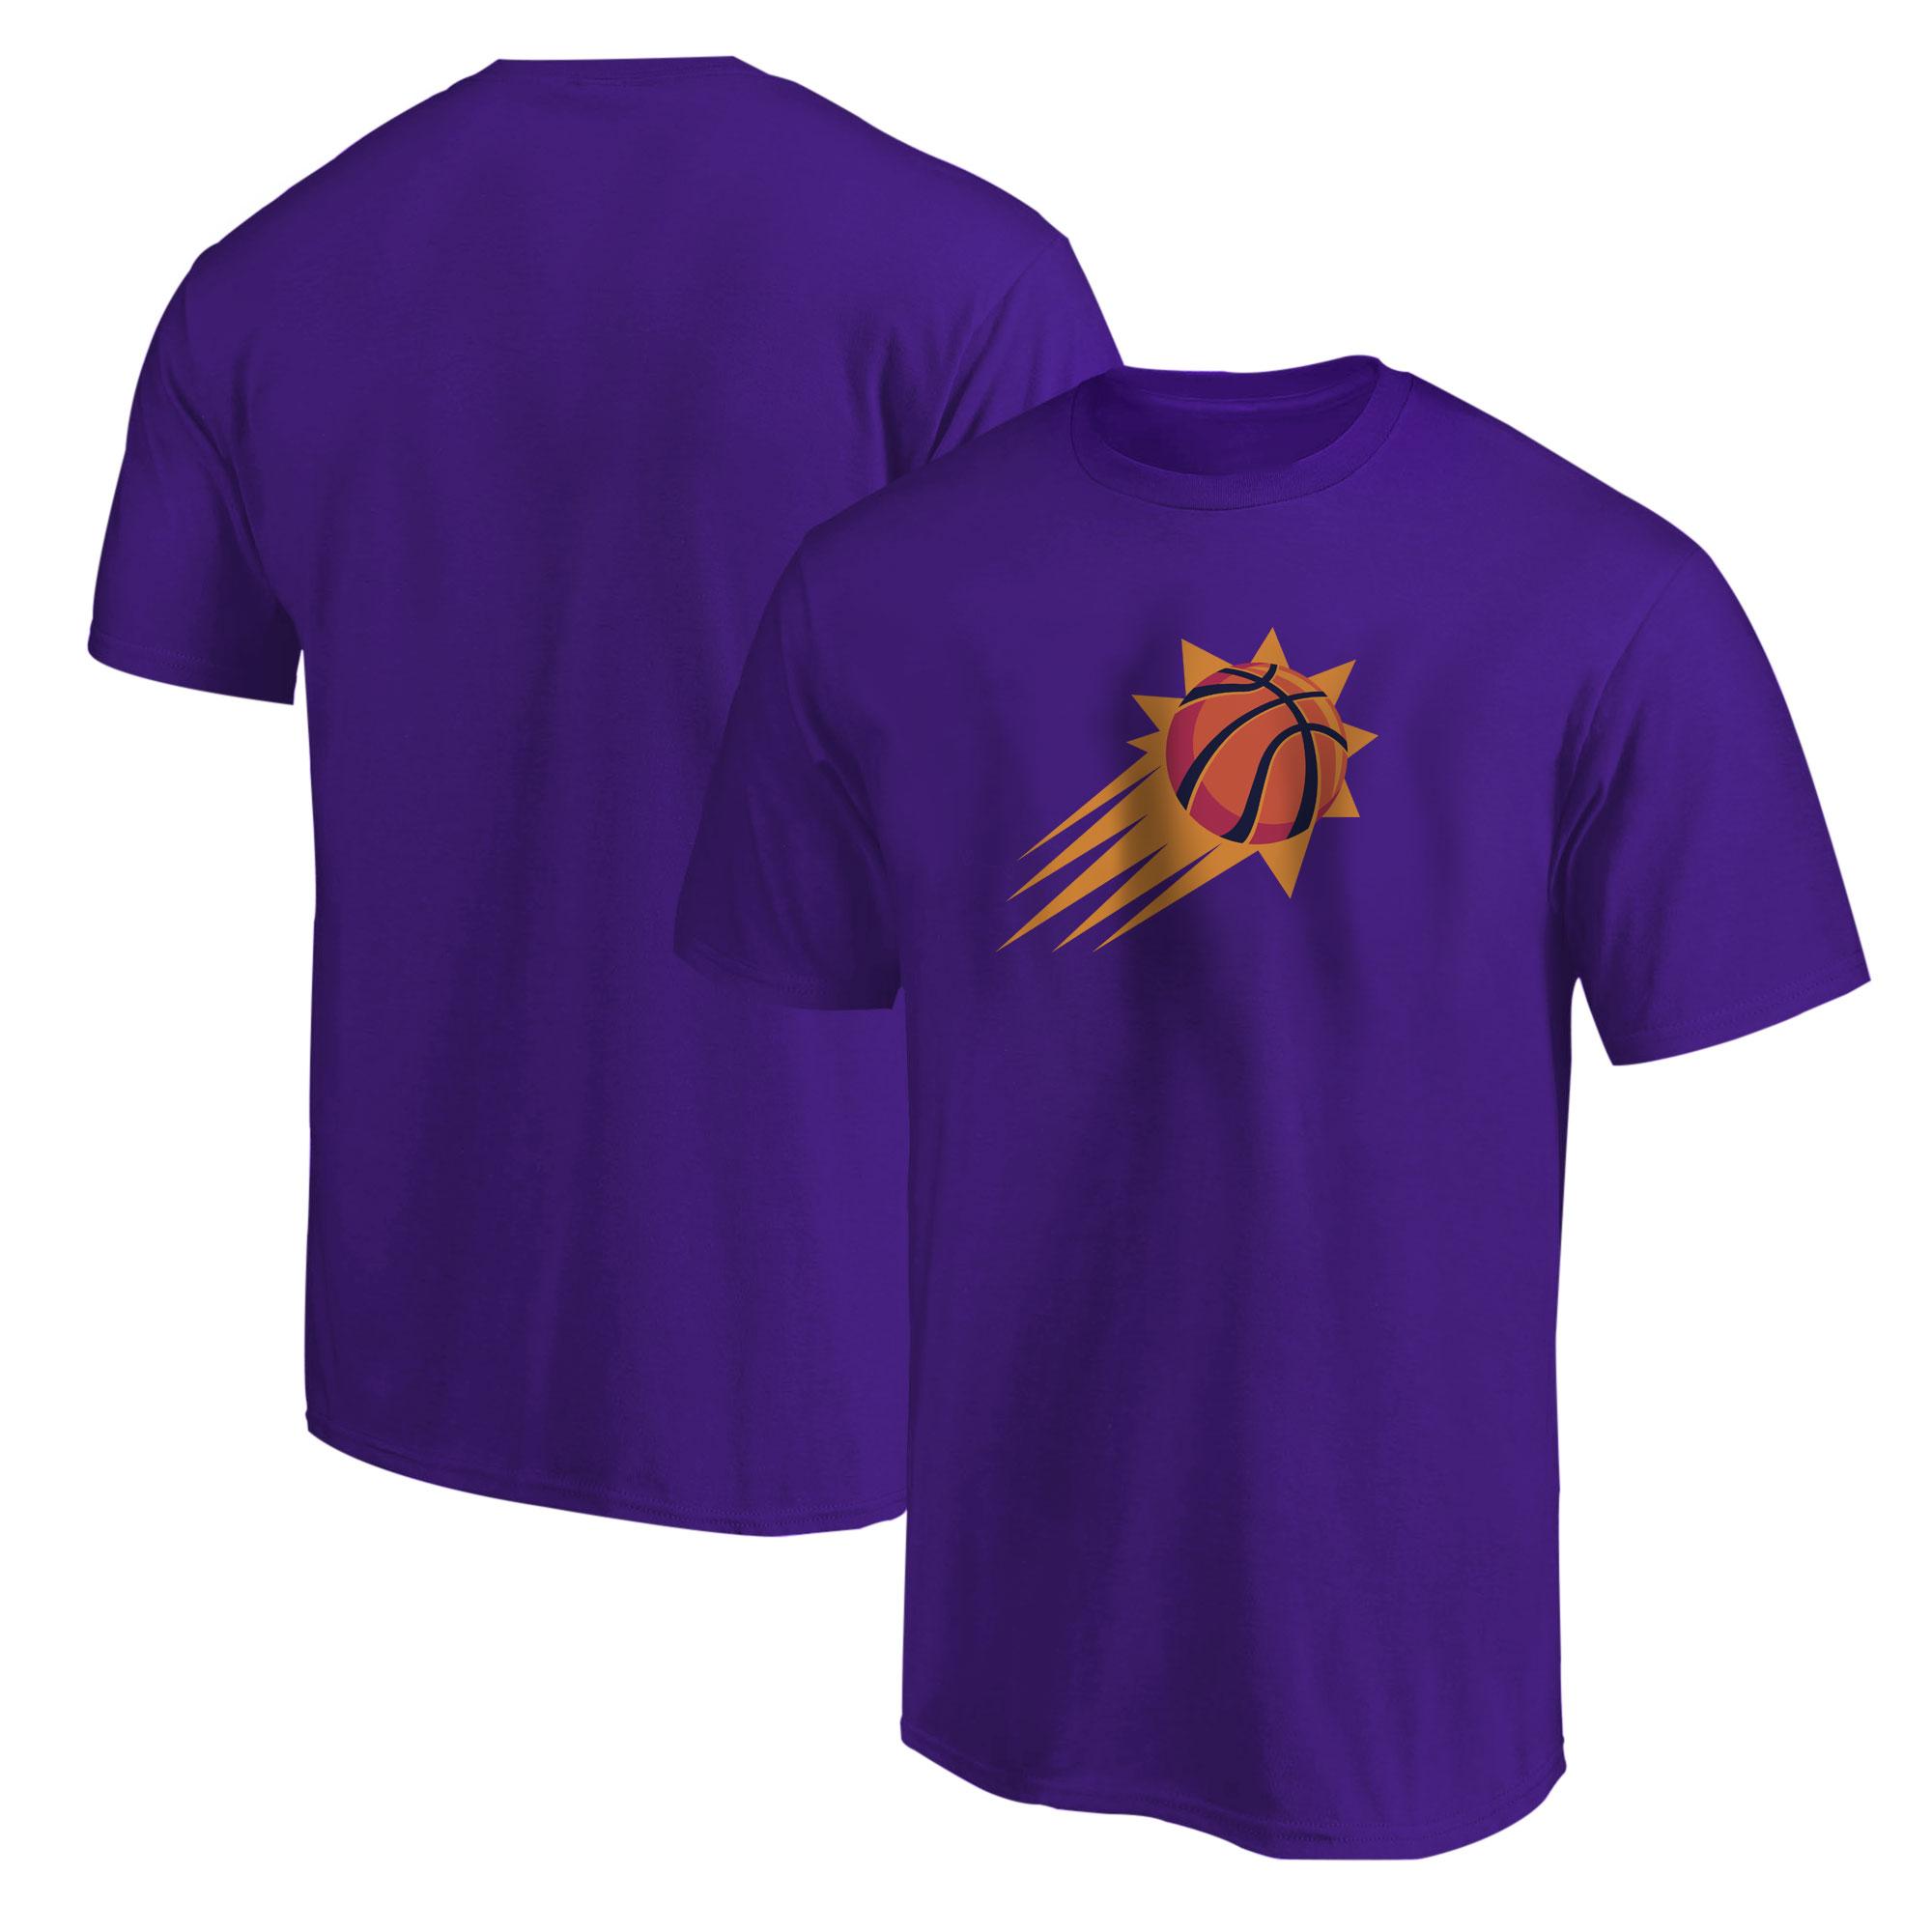 Phoenix Suns Tshirt (TSH-PRP-NP-406-NBA-PHO-SUNS-NEW)